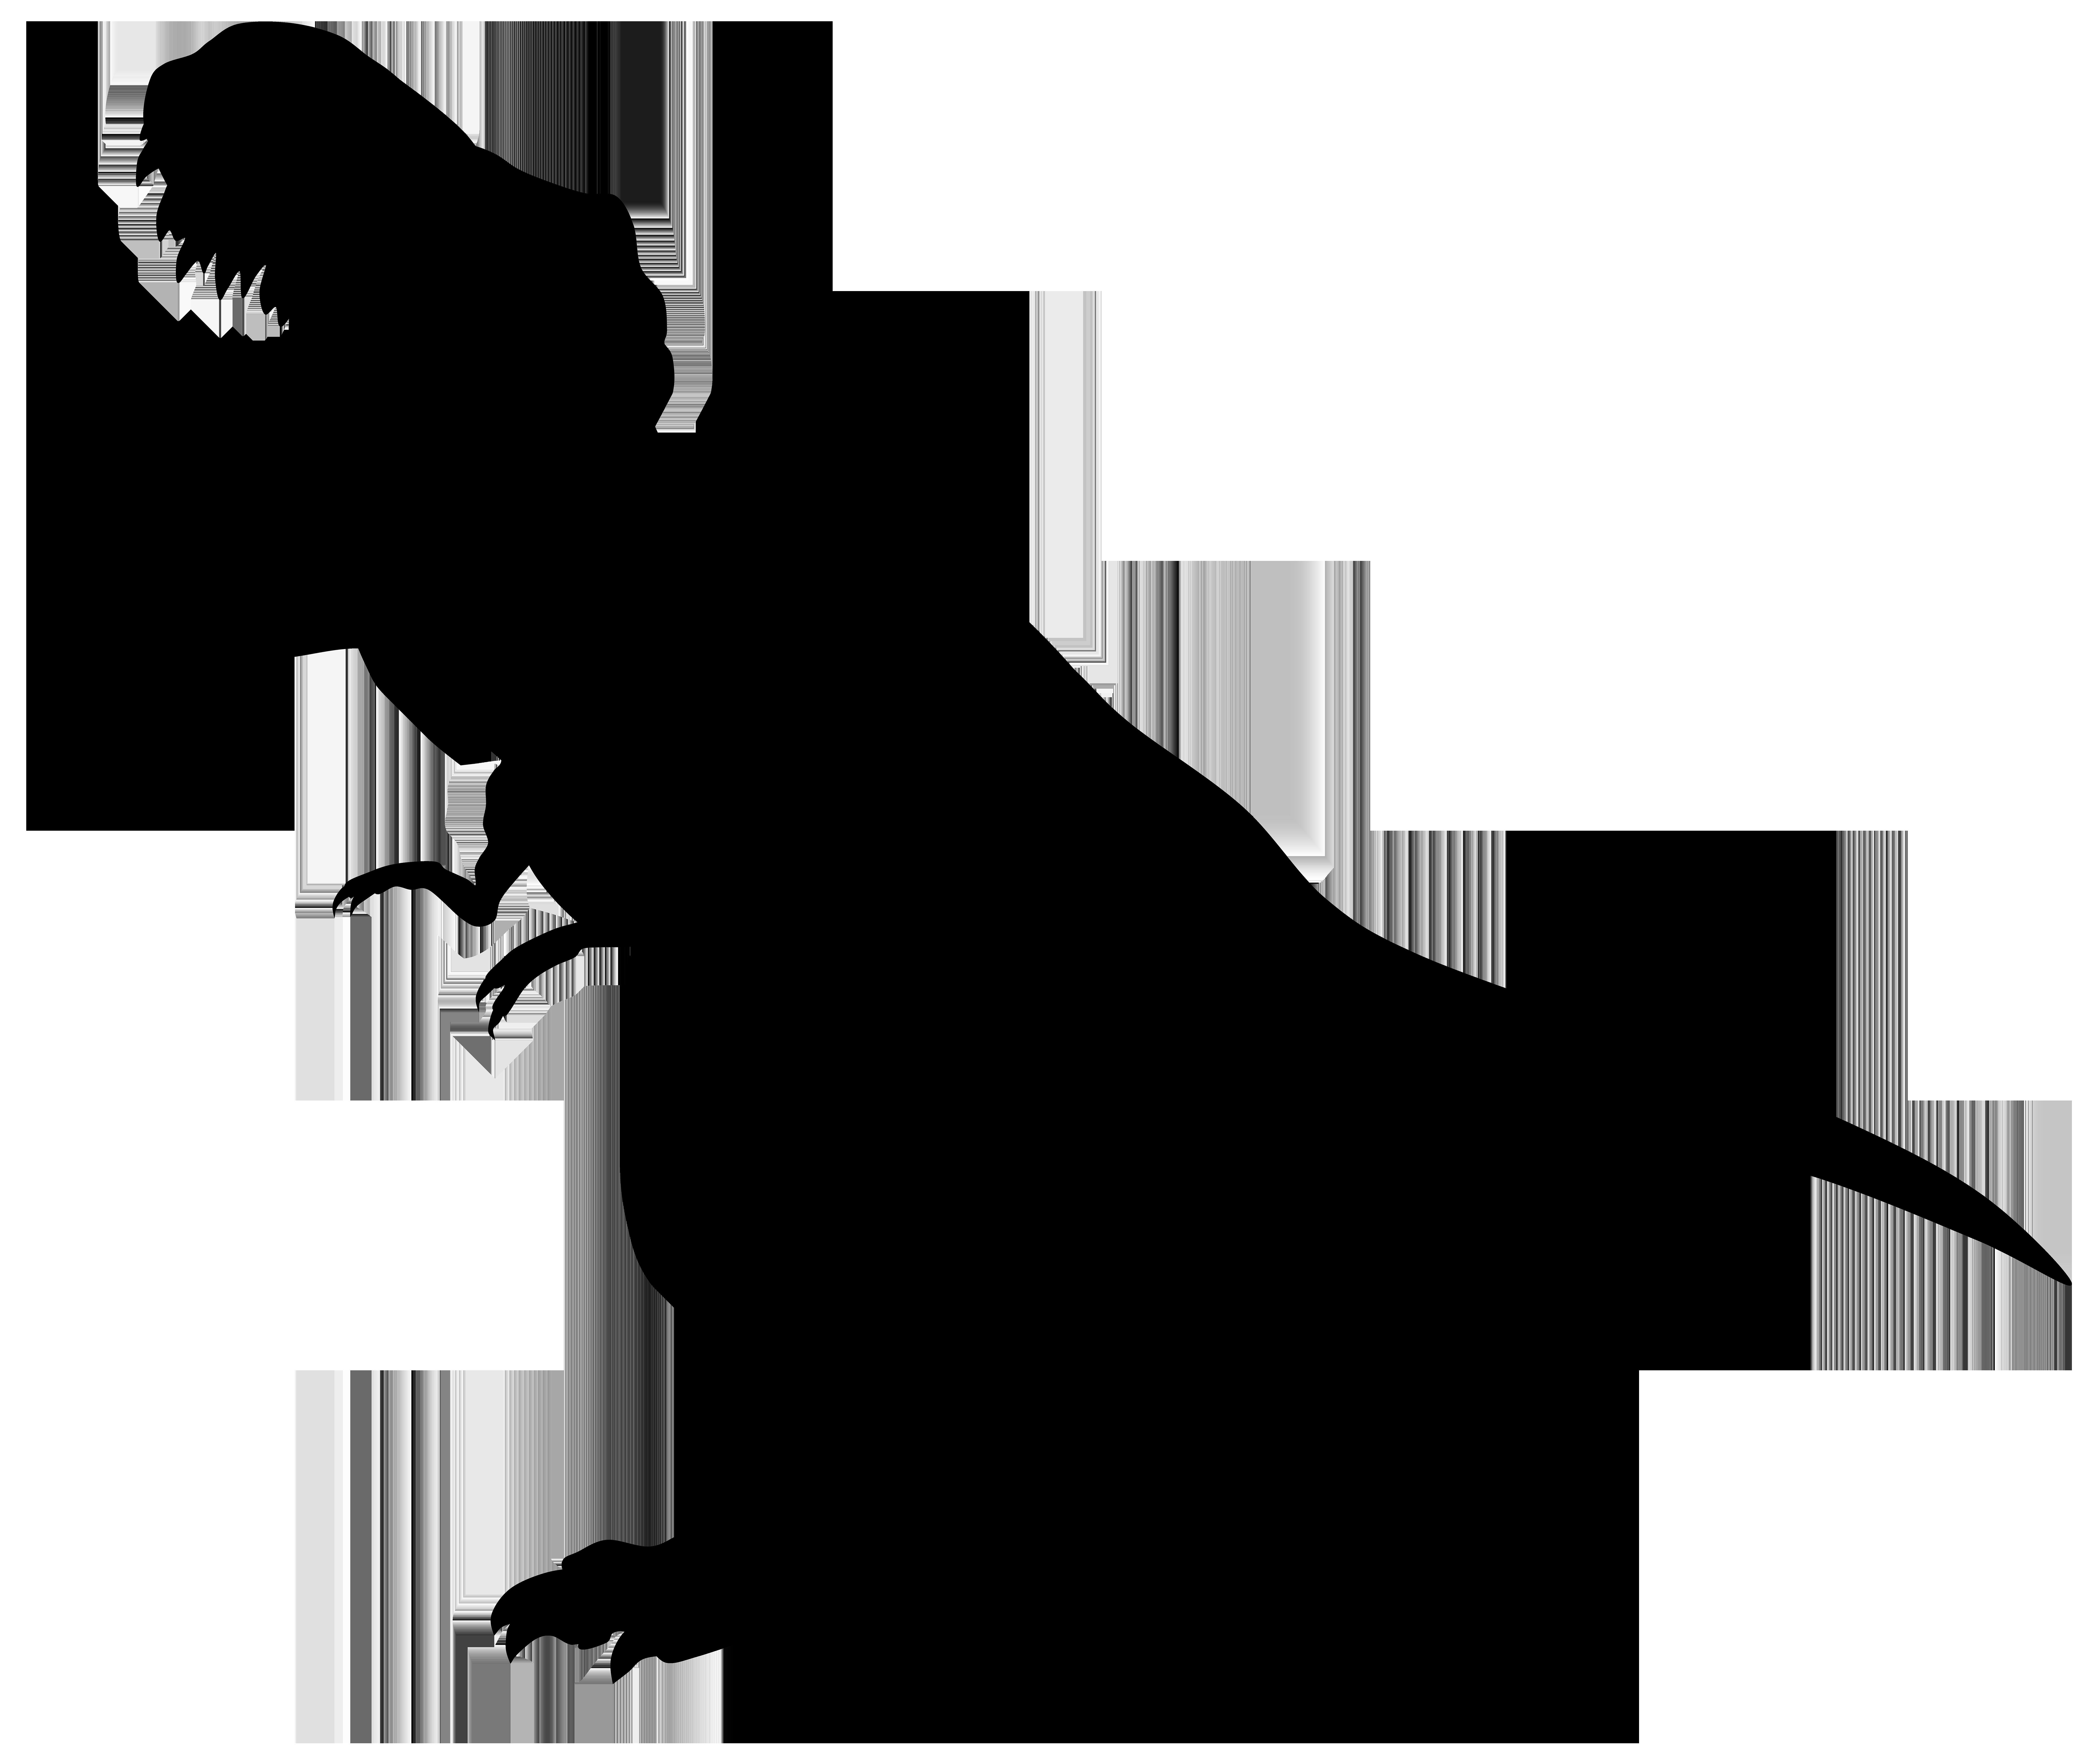 T silhouette at getdrawings. Clipart dinosaur dinosaur skeleton